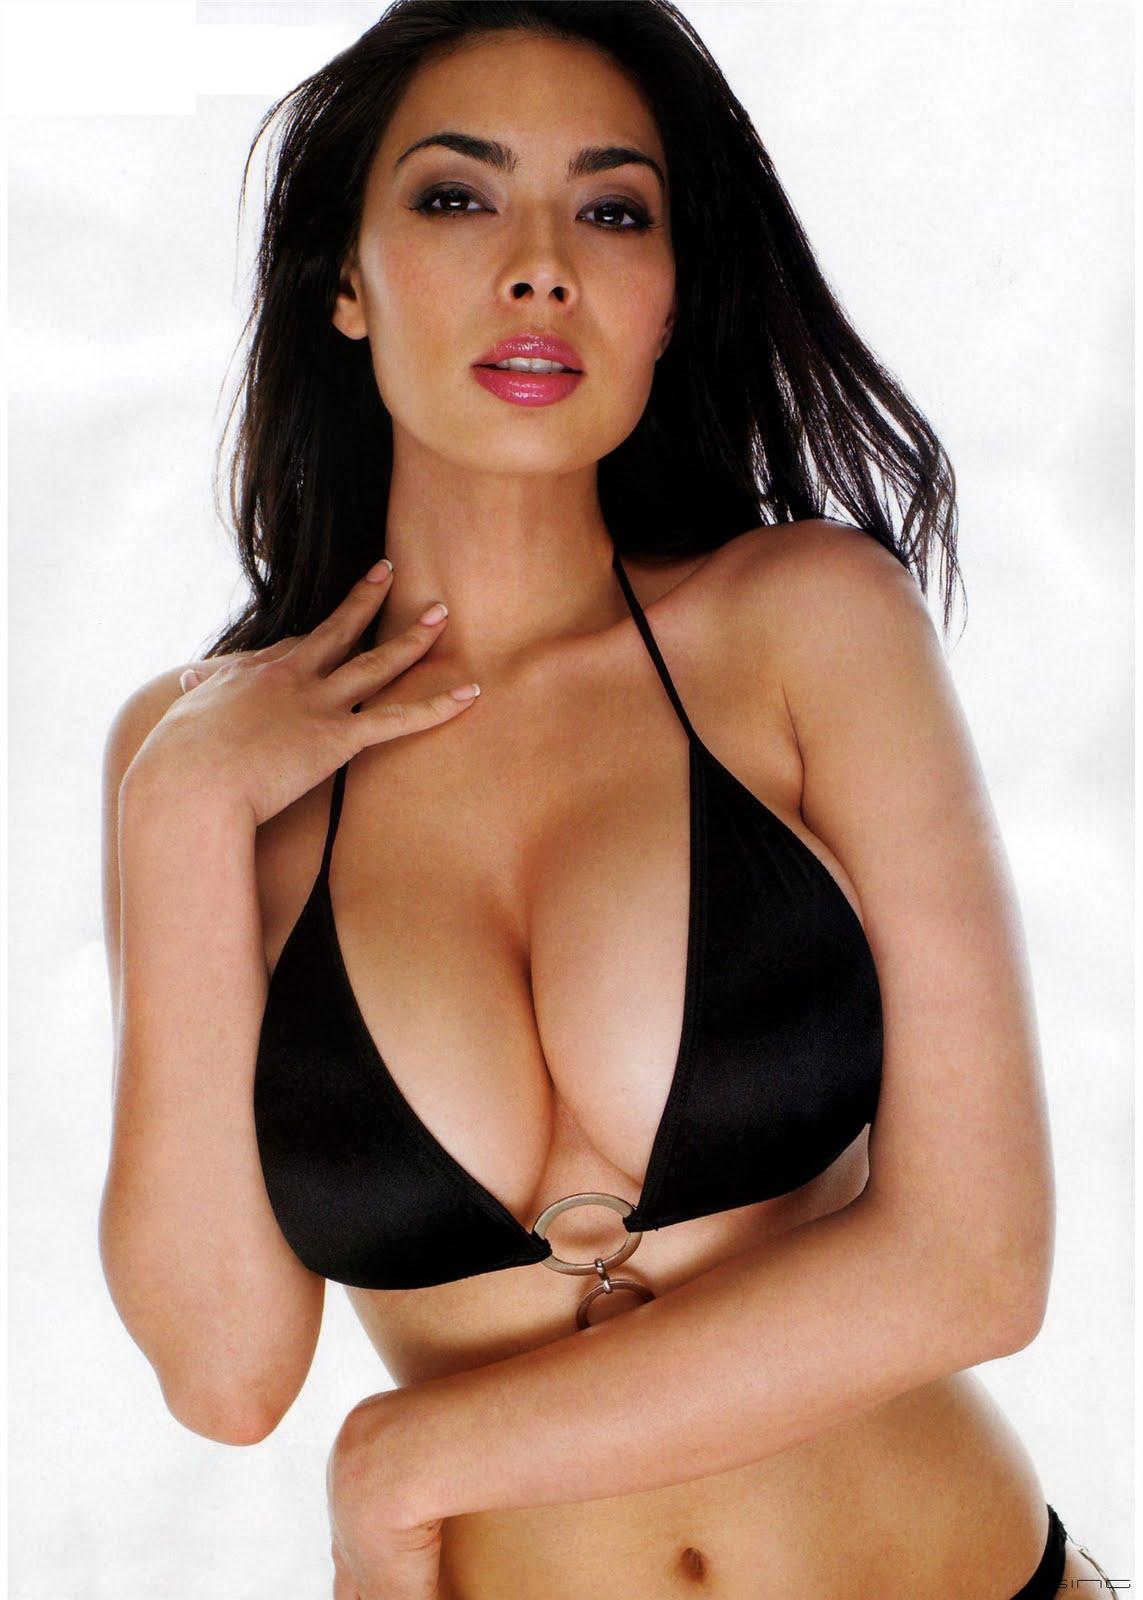 Pornstars: Tera Patricks hot N sexy photos